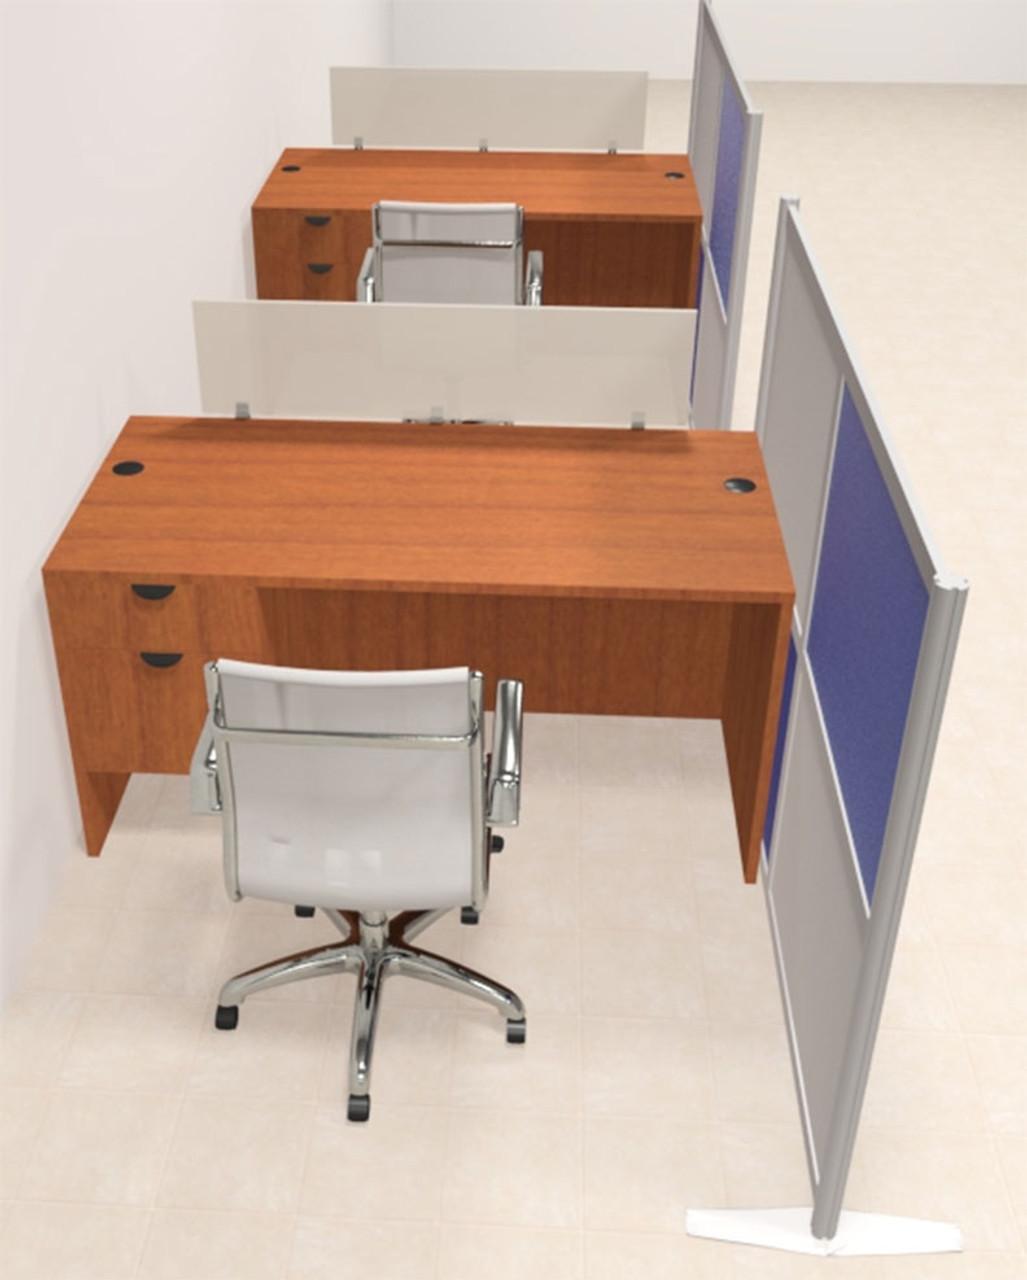 Two Person Workstation w/Acrylic Aluminum Privacy Panel, #OT-SUL-HPB41